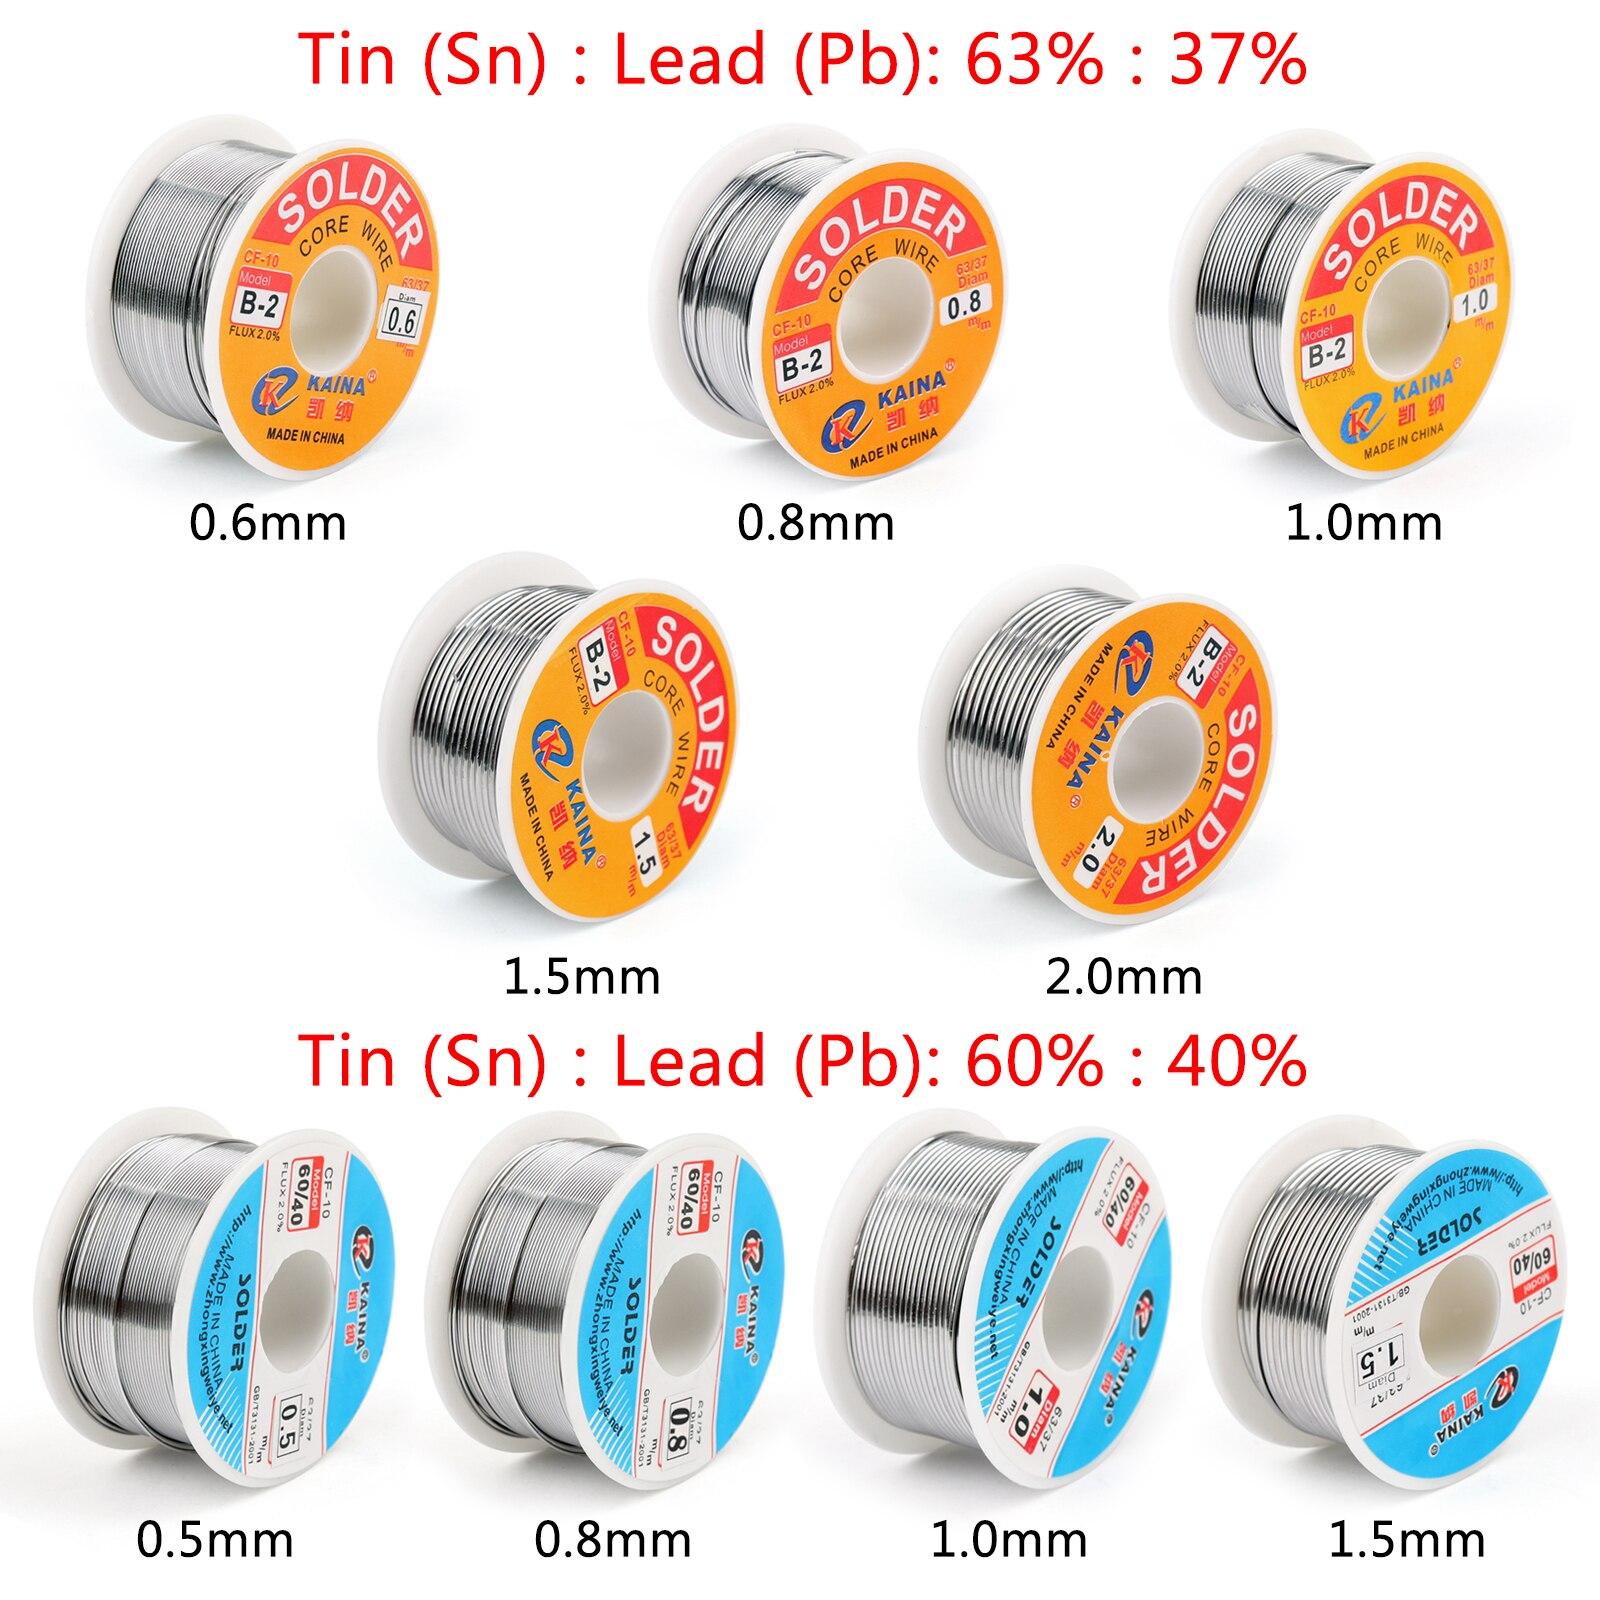 Areyourshop 100g 60/40 63/37 0.5mm/0.8mm/1.0mm/1.5mm rosin tin chumbo solda fio com fluxo de 2% para solda